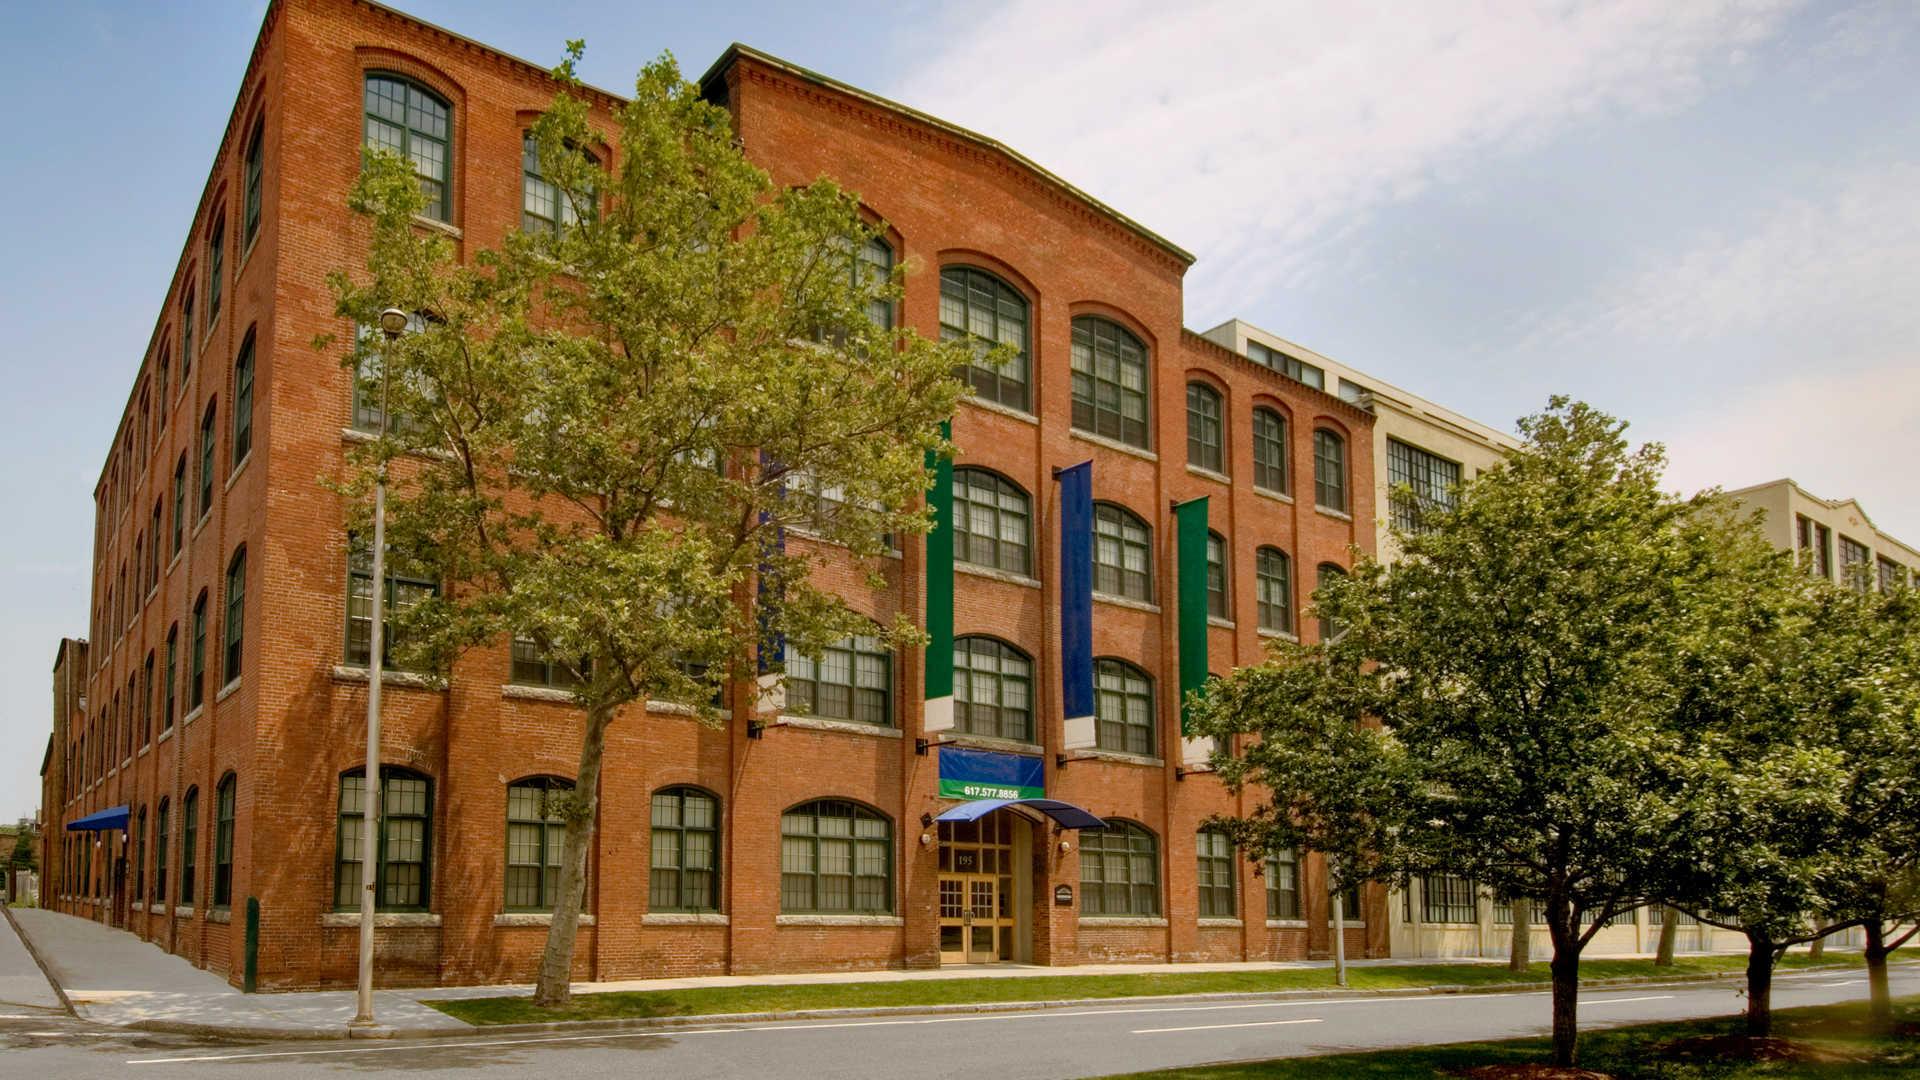 Lofts at kendall square apartments exterior